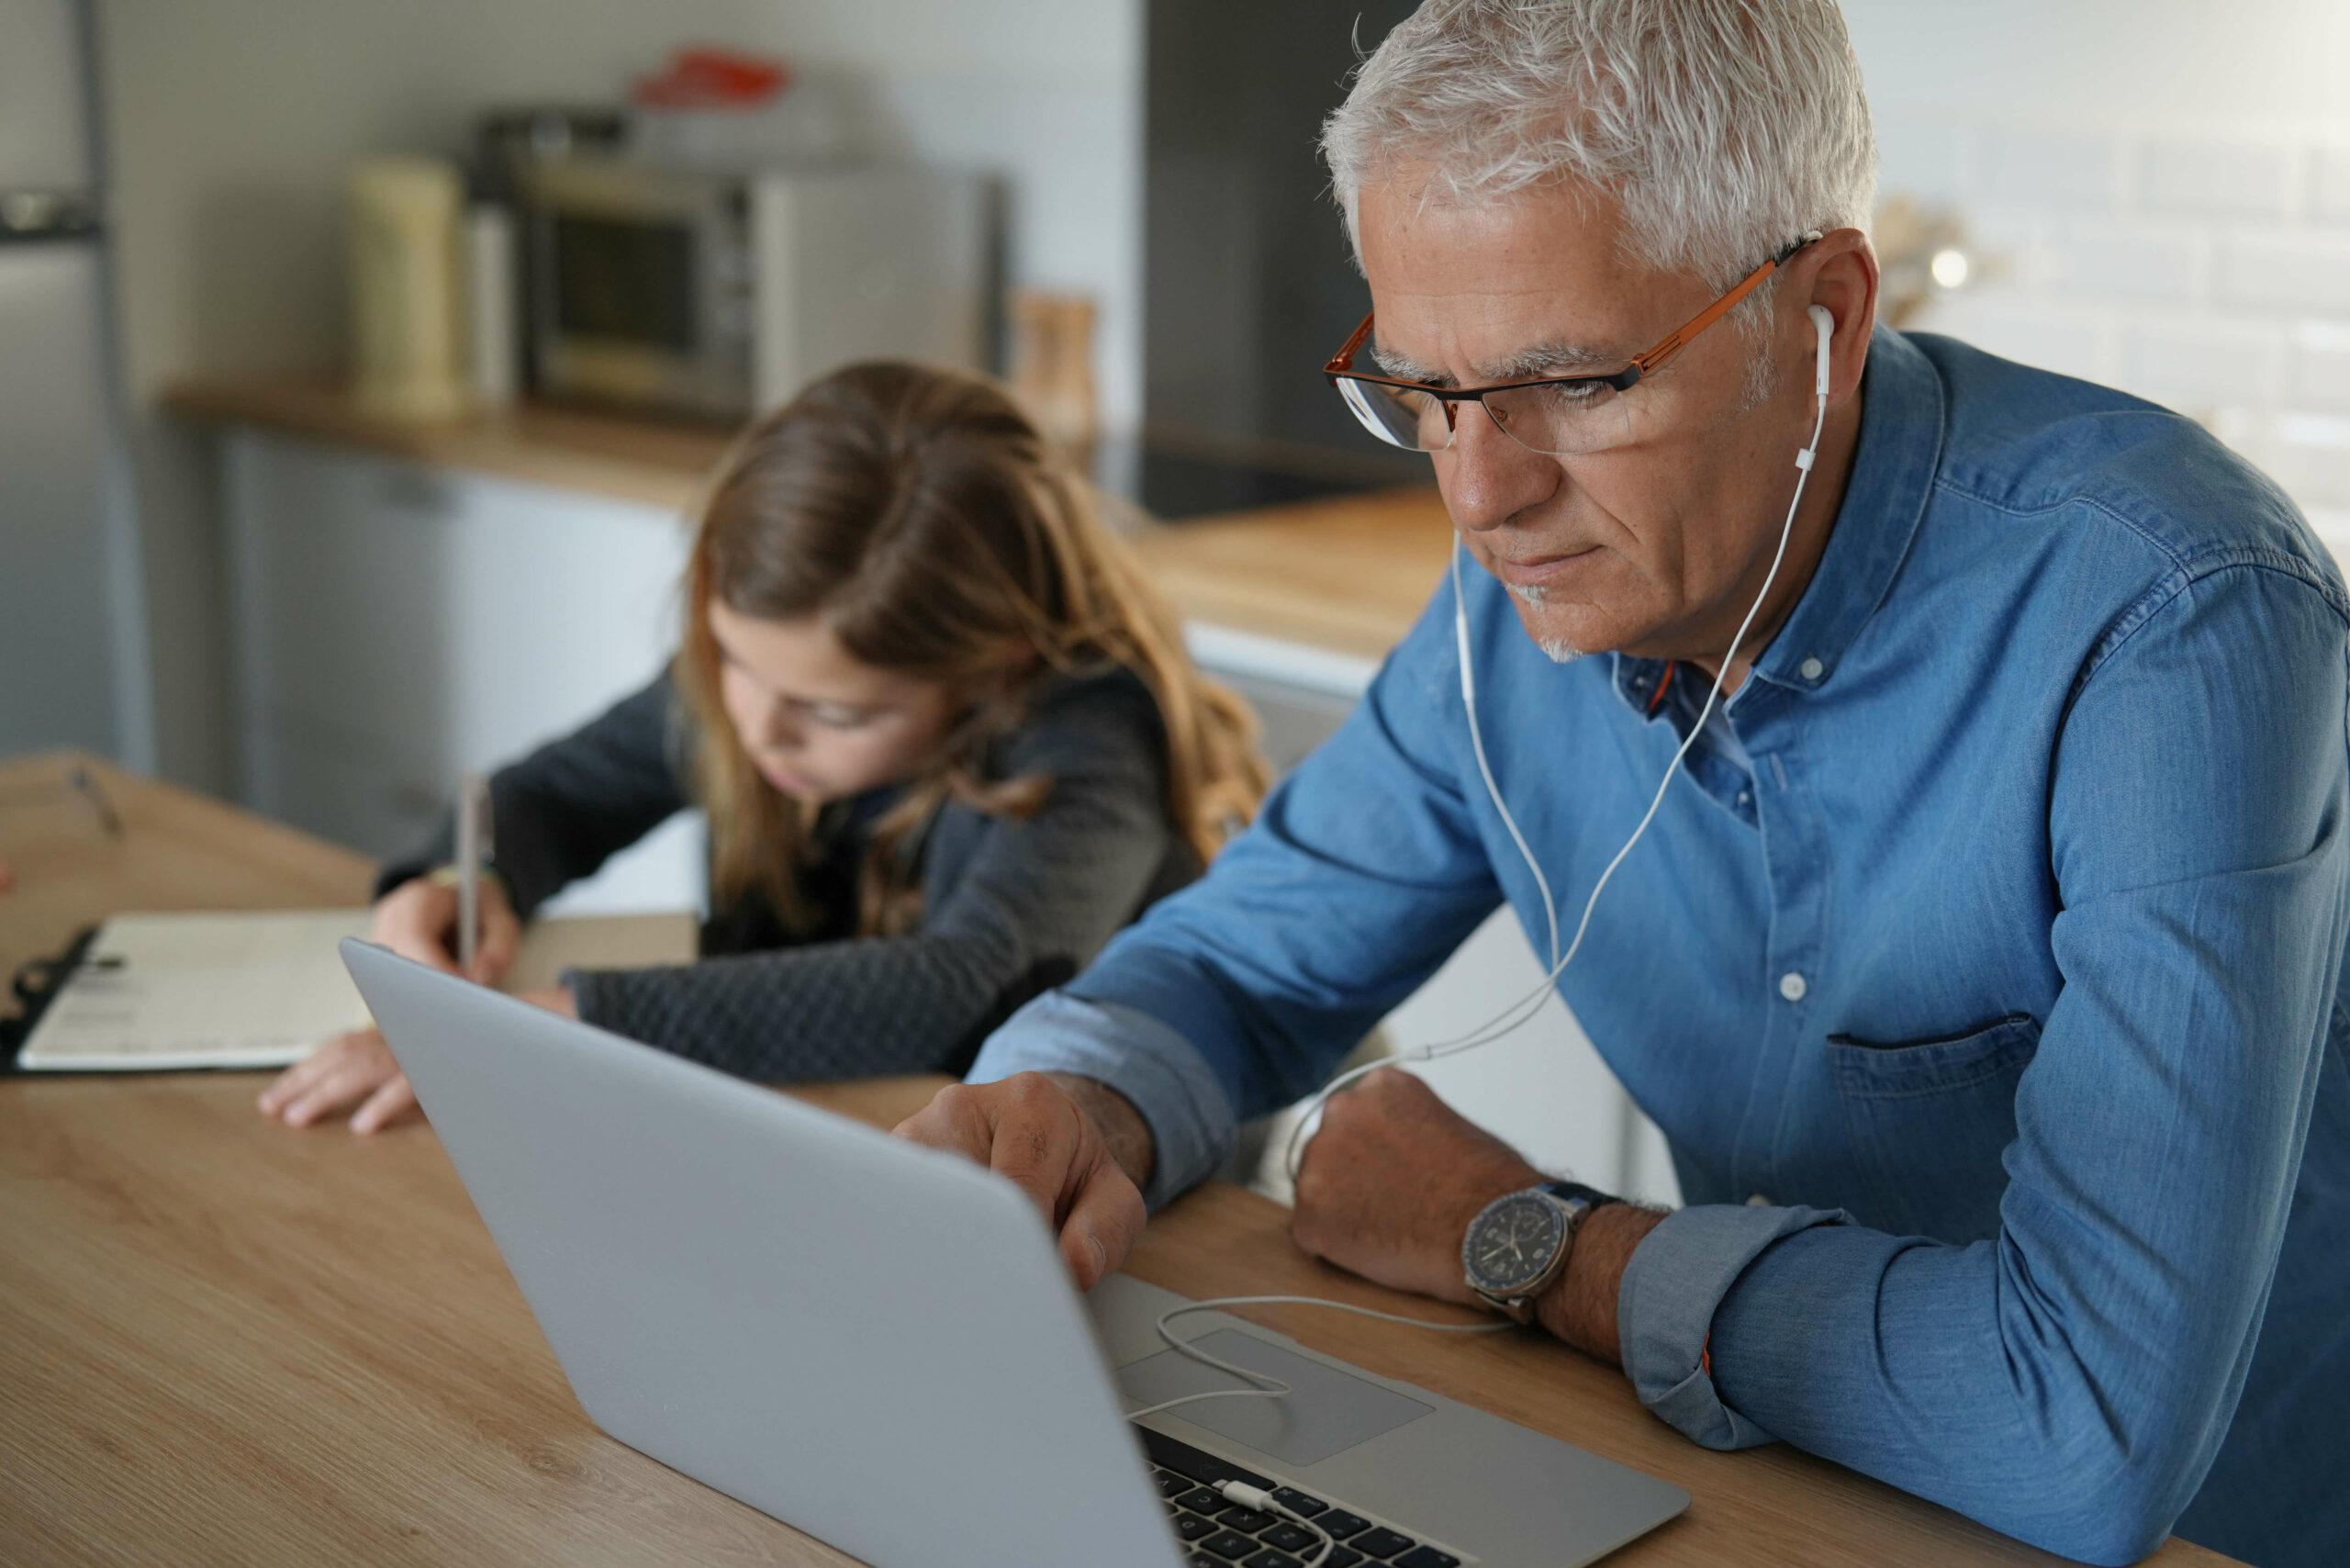 Kinderbetreuung im Homeoffice: 7 Tipps